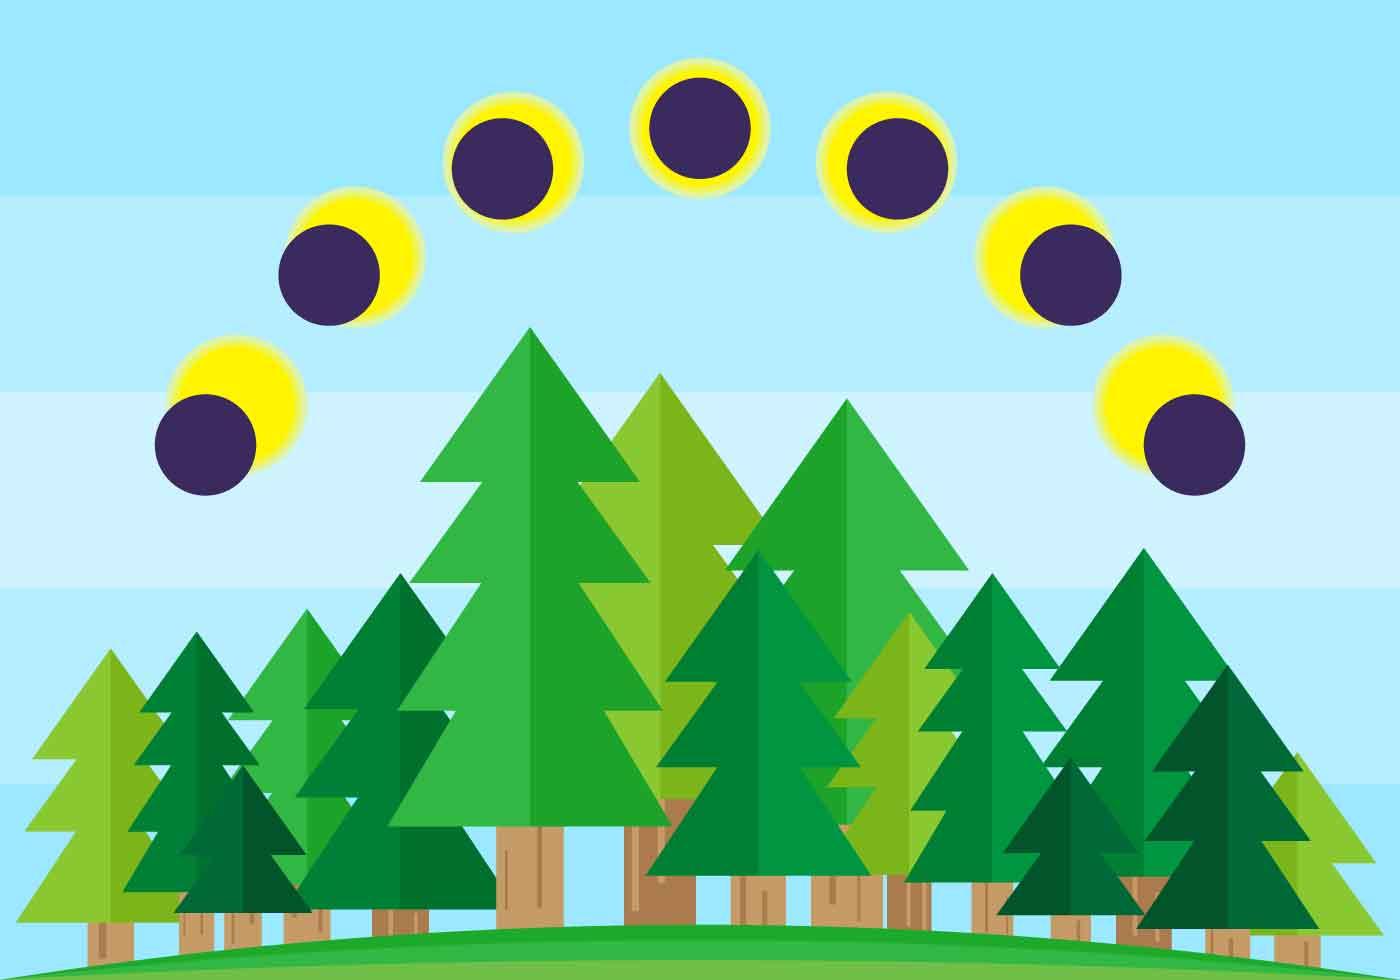 Free Outstanding Solar Eclipse Vectors Download Vector Art Illustration System Orbit Diagram Digital Stock Graphics Images